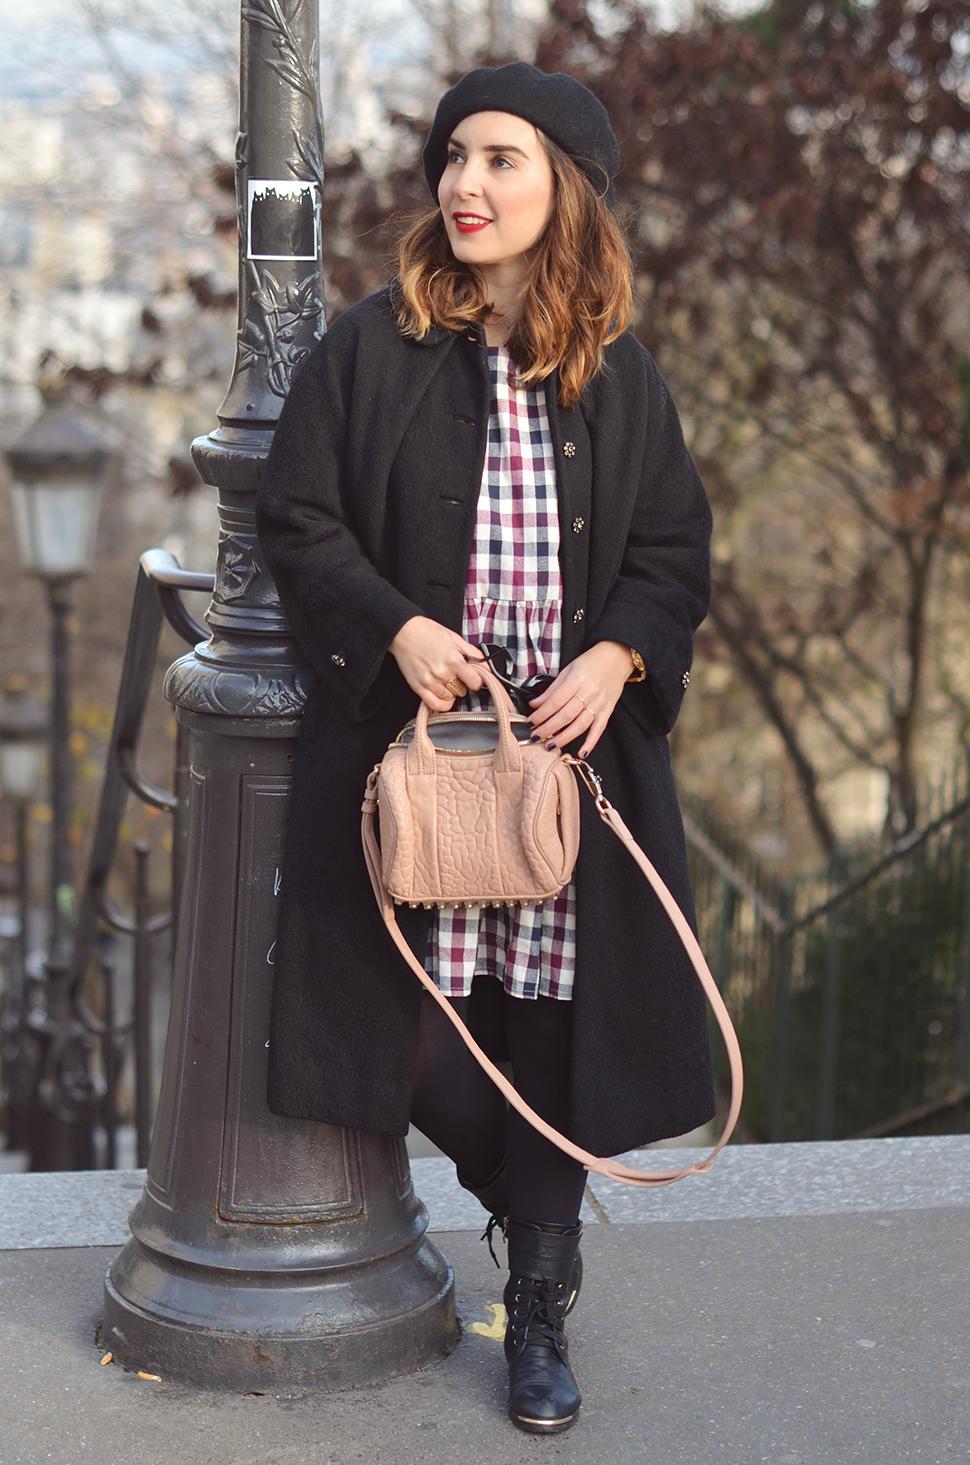 Helloitsvalentine_Montmartre_16